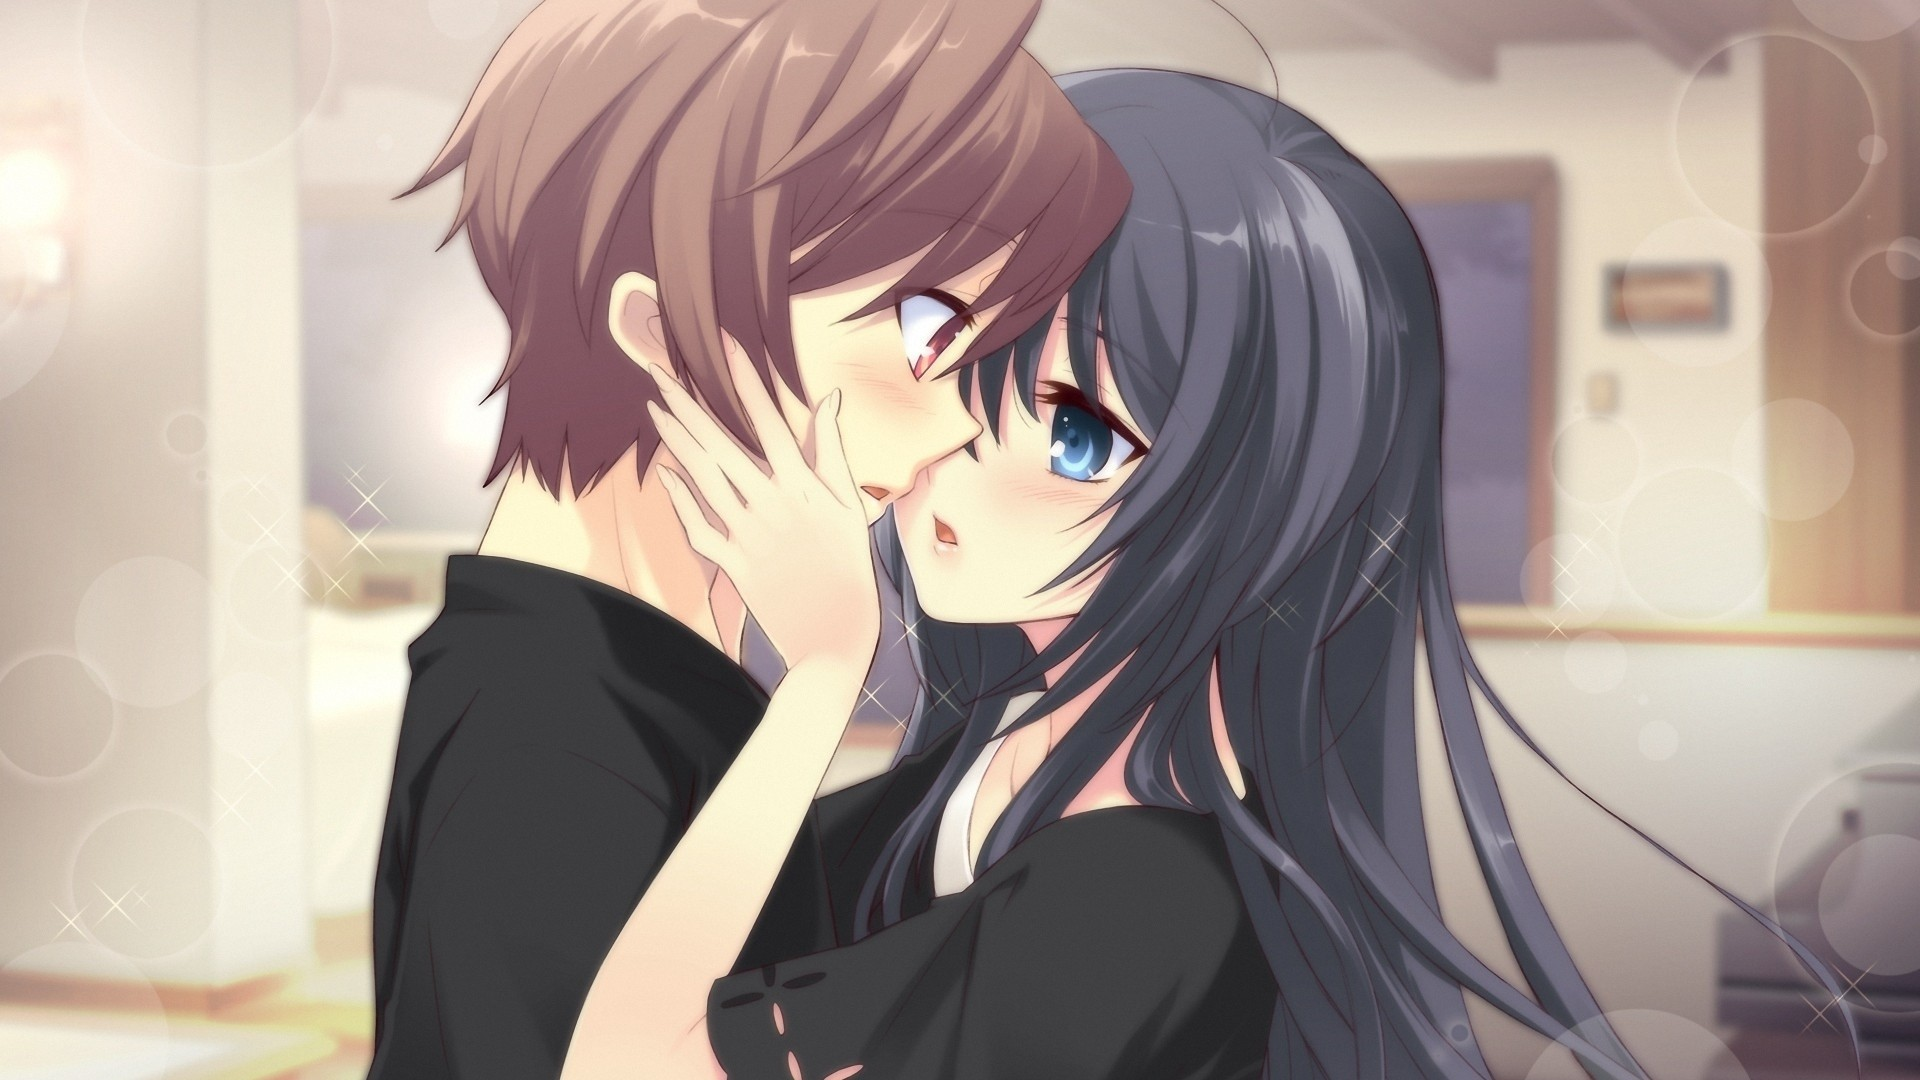 Cute Anime Couple Kiss Wallpaper [1920×1080] Need #iPhone #6S #Plus #